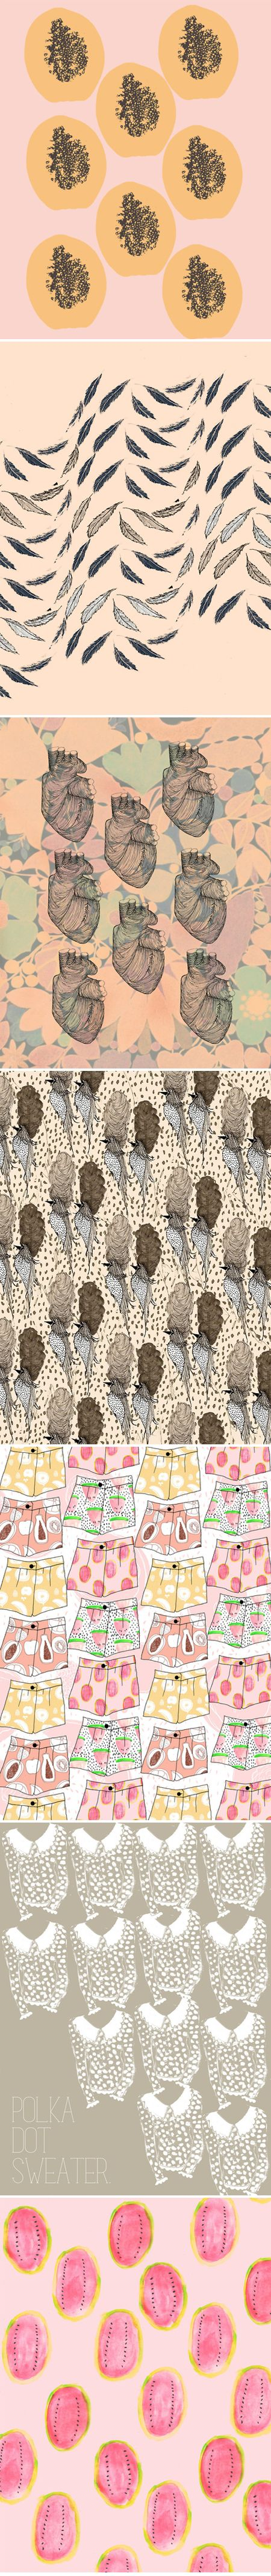 patterns by kendra dandyArtists, Jealous Curator, Pattern Design, Prints Design, Dandy Pattern, Painting Colors, Kendra Dandy1, Pattern Art, Surface Design